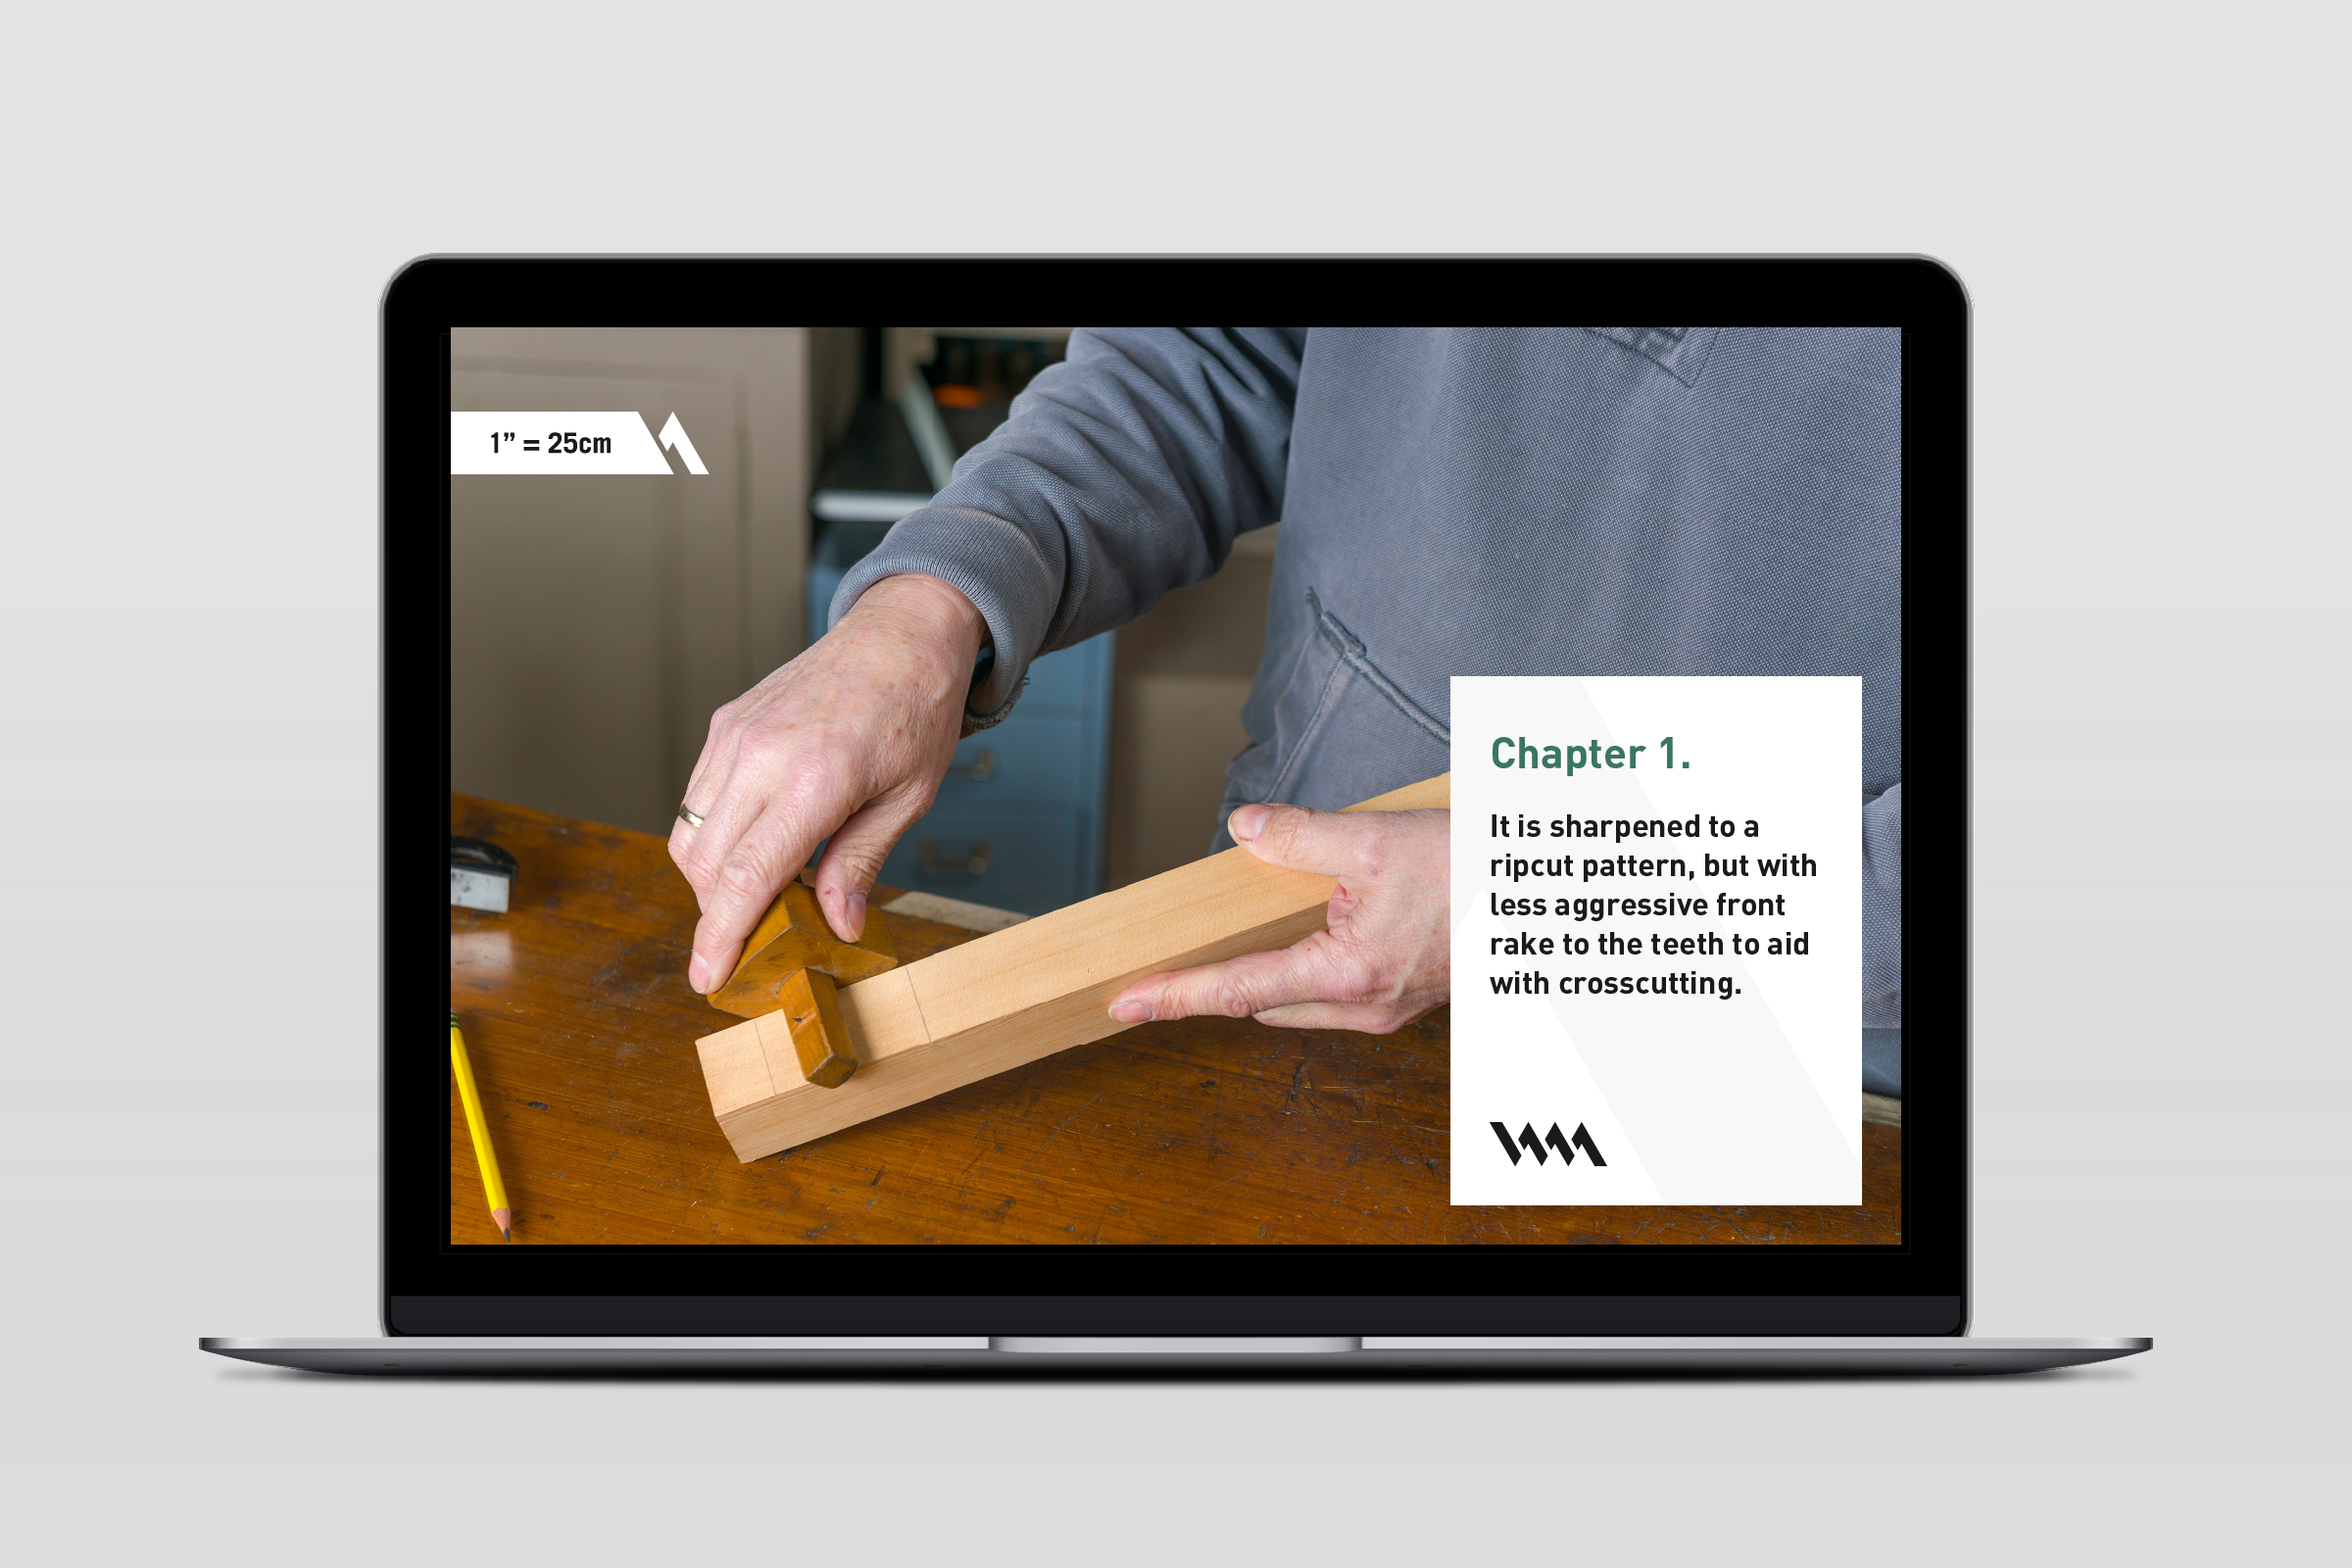 Image of laptop showing online tutorial